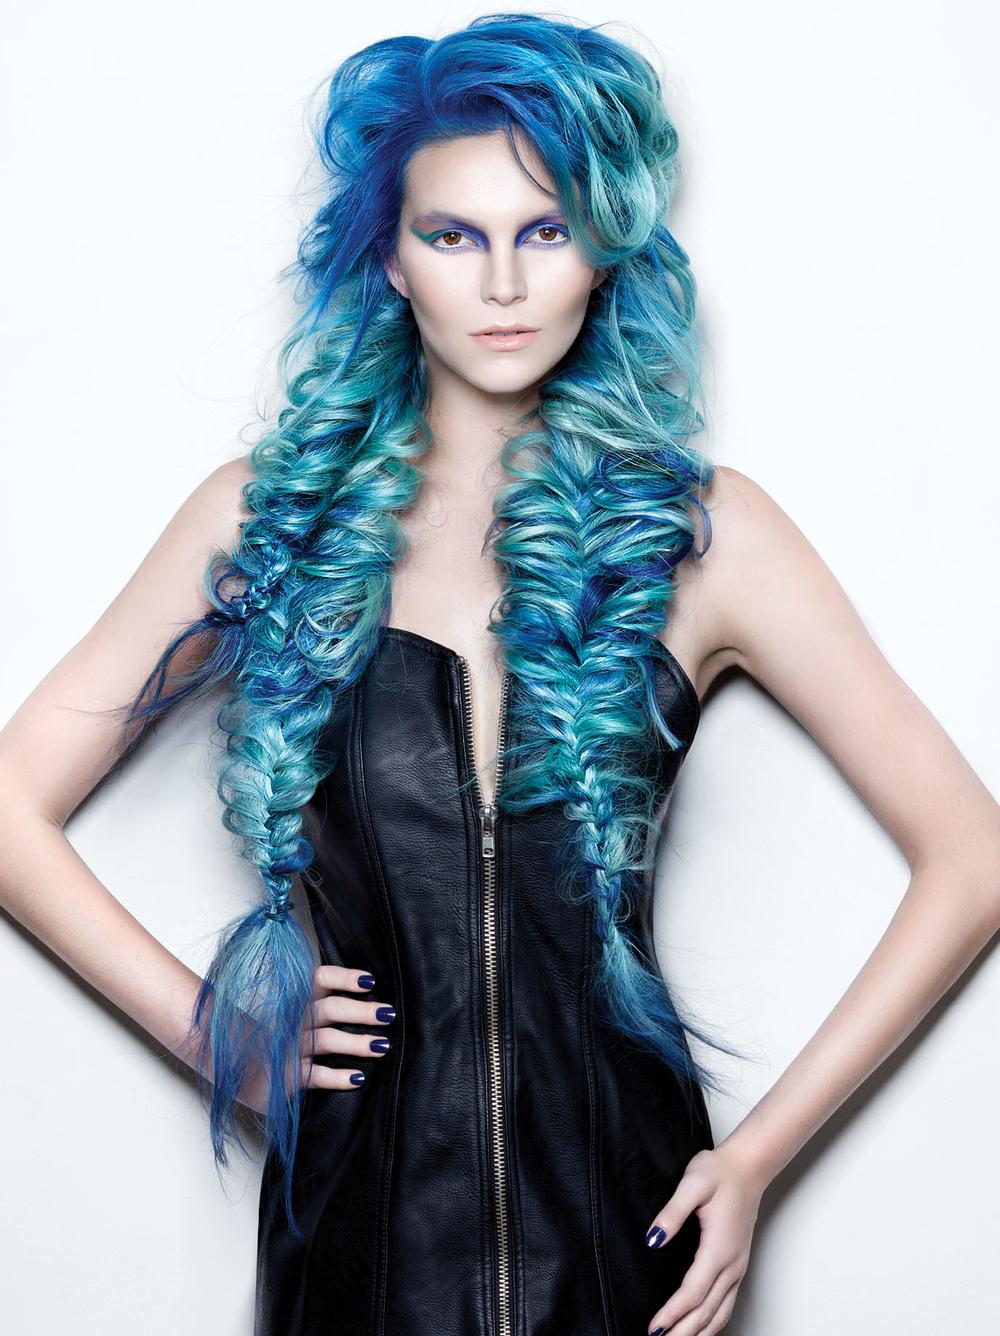 <p>Hair: Christopher Smith + Saretta Bowerman for R+Co and Great Lengths</p> <p>Photographer: Roberto Ligresti</p> <p>Makeup: David Maderich and Jacquelyn Jordan</p> <p>Nails: Galyna Poczciwinski</p>